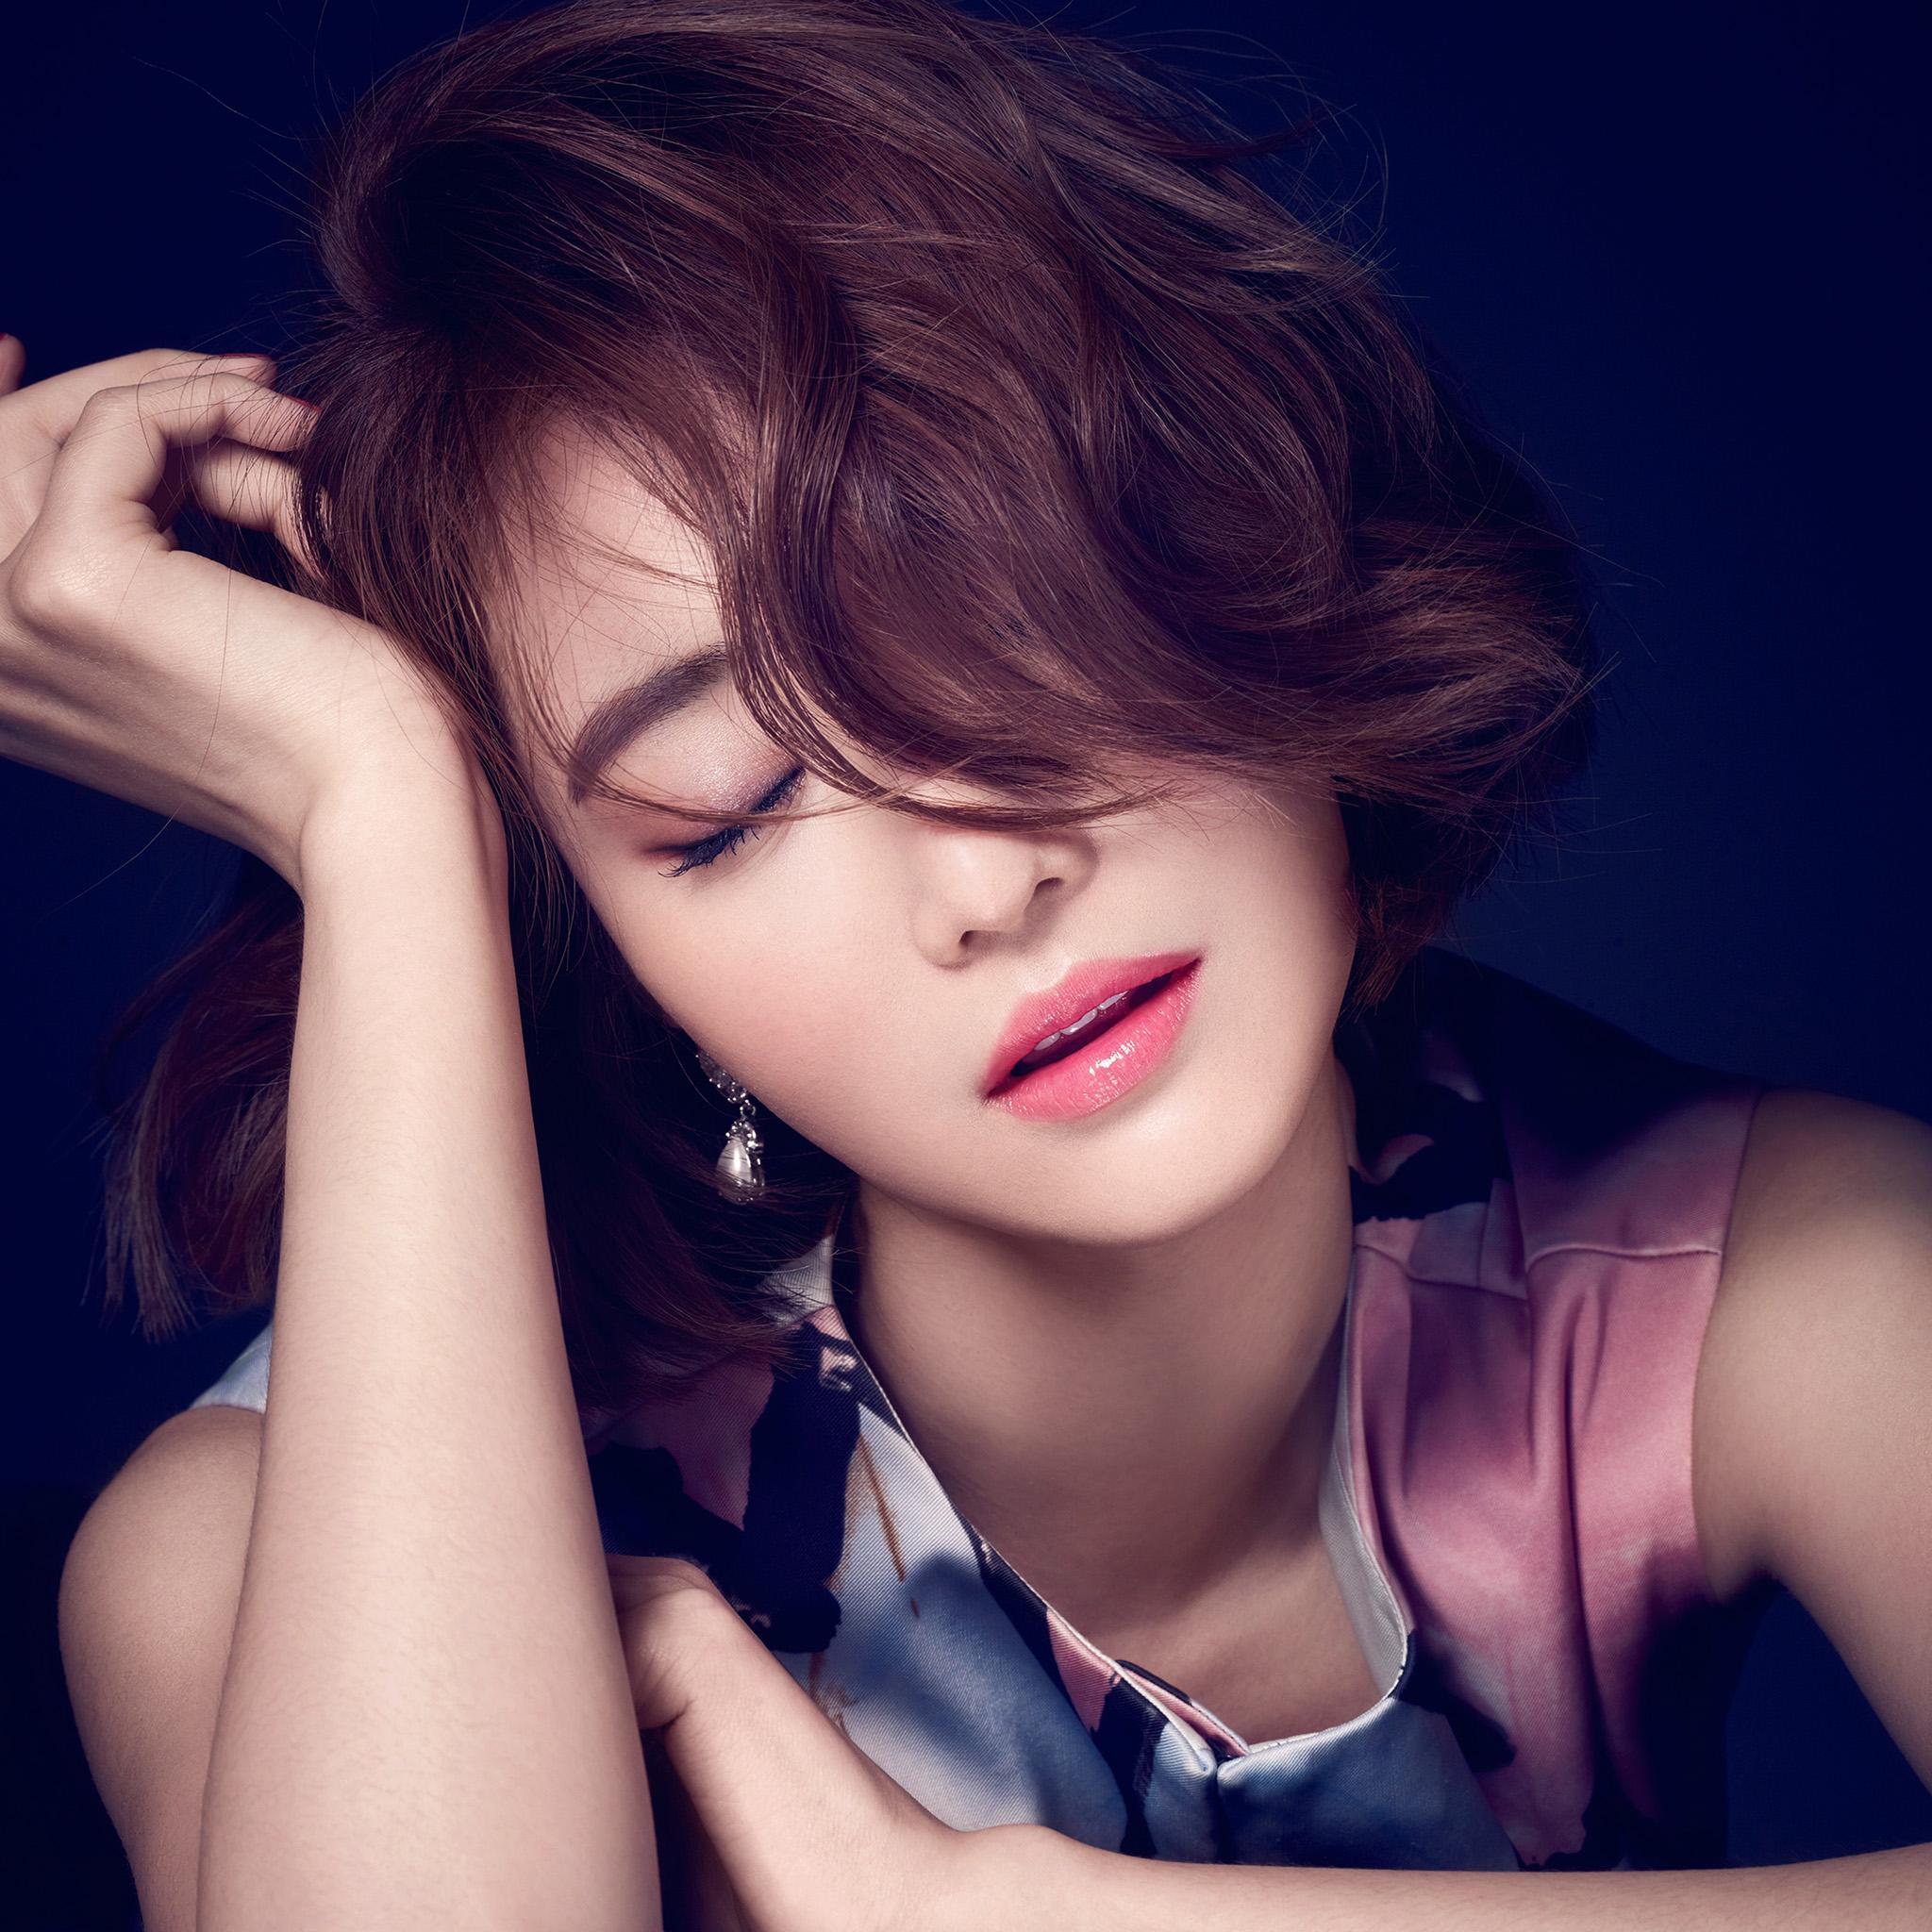 Hf59-ko-joon-hee-kpop-film-actress-closed-eyes